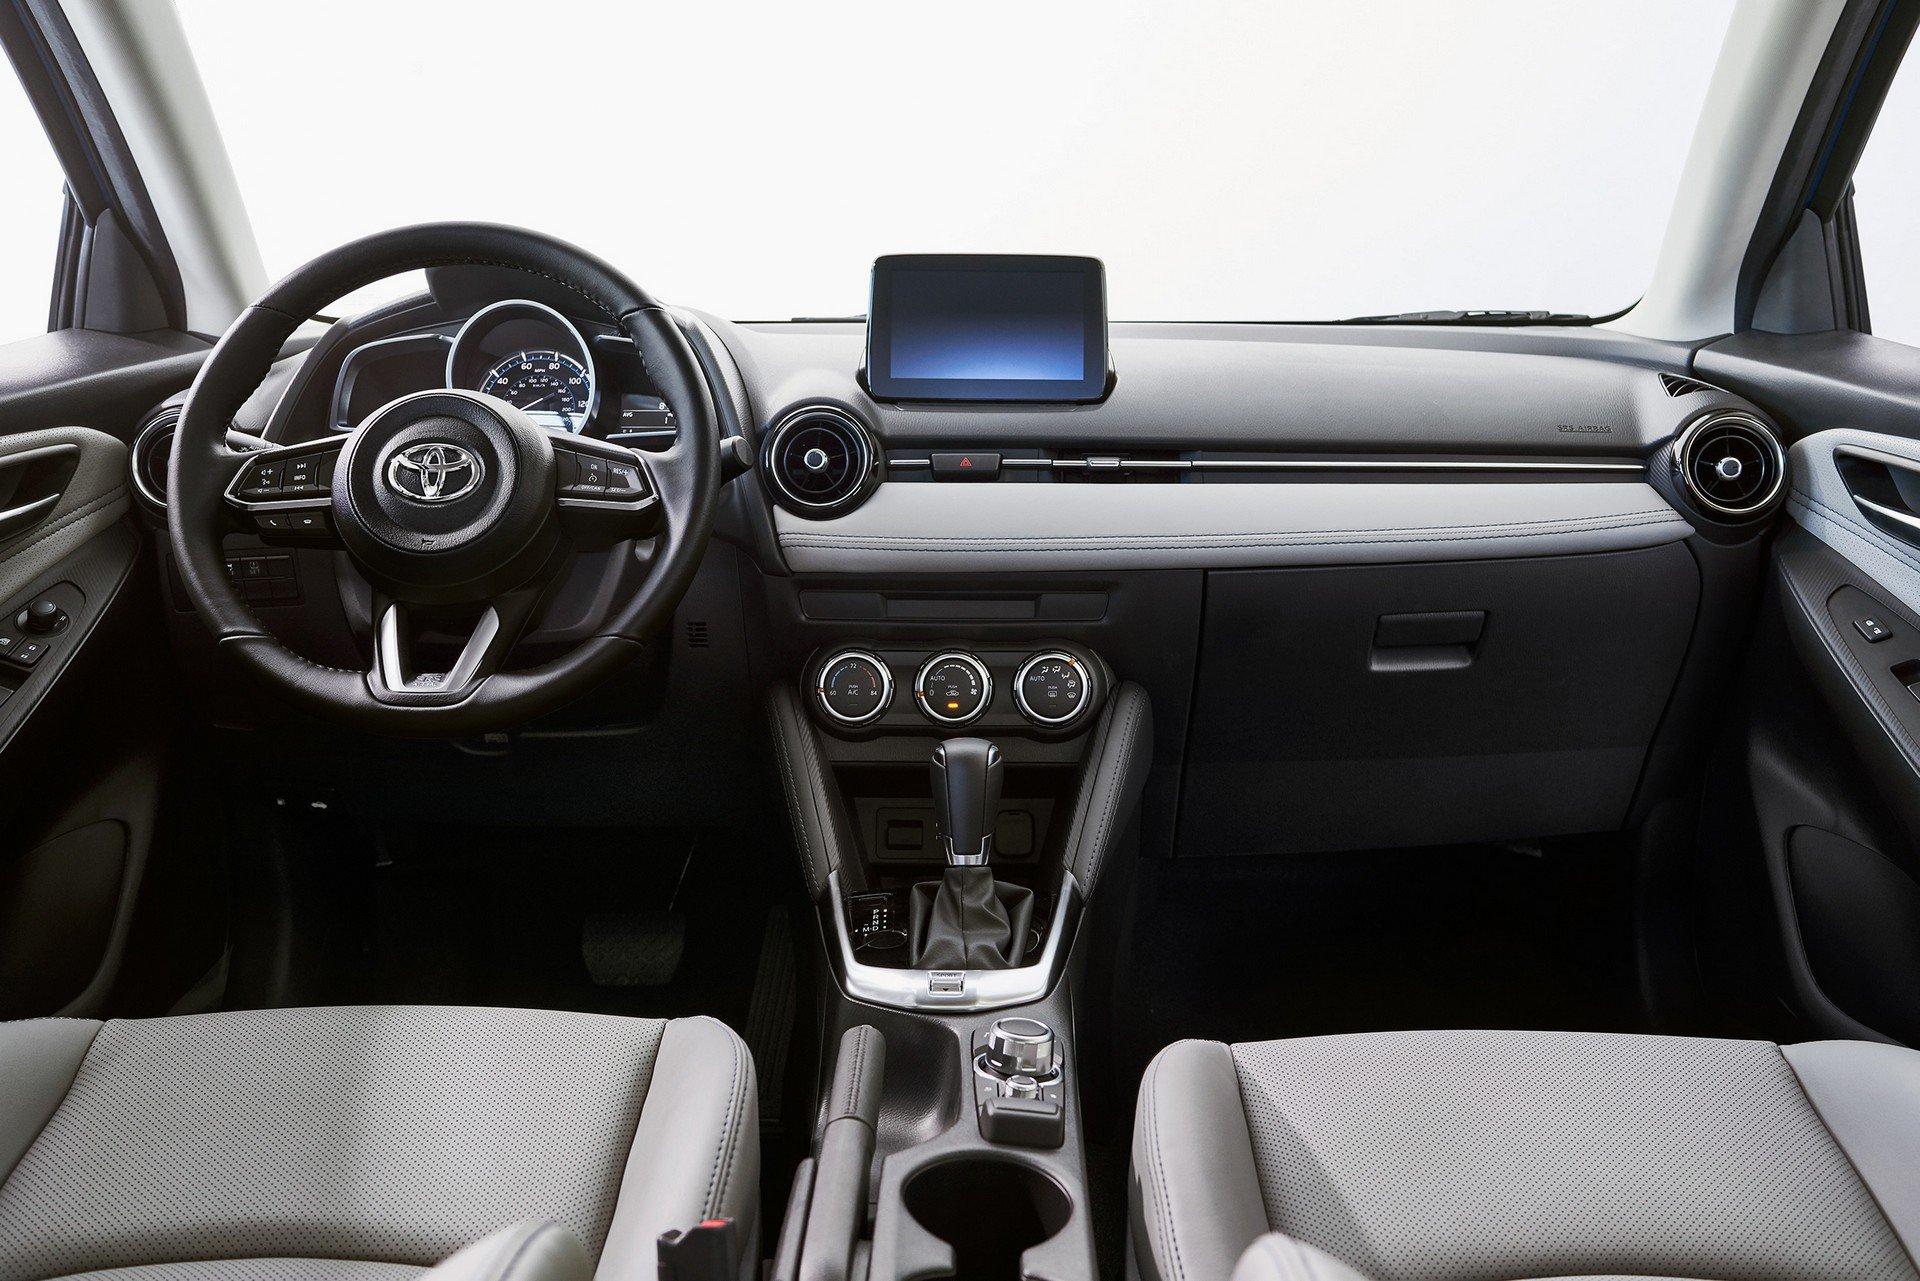 Toyota-Yaris-Hatchback-2020-9